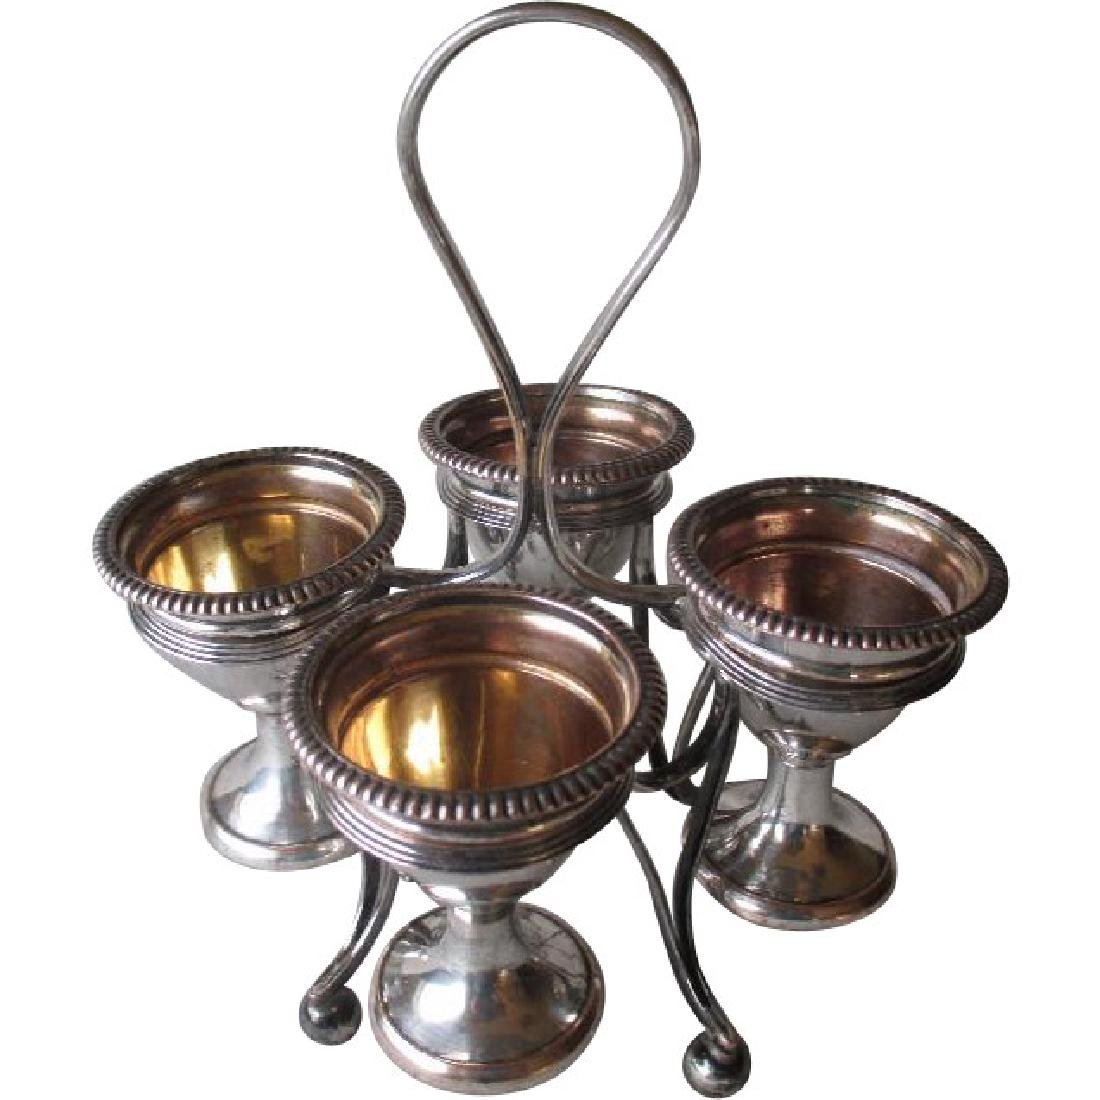 Great Vintage Silver Plate Egg Cup Holder